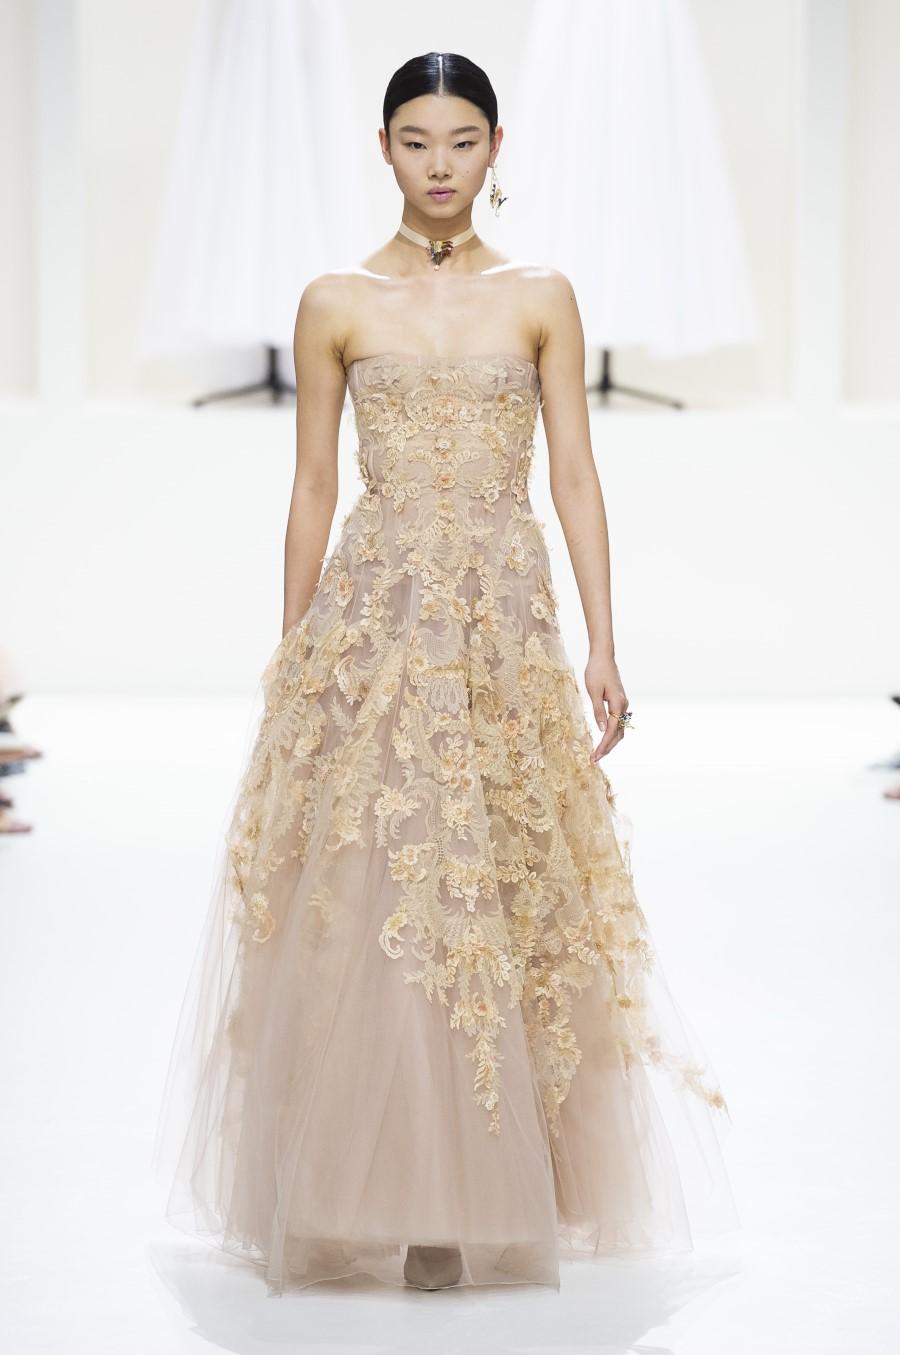 Christian Dior Haute Couture Fall Winter 2018